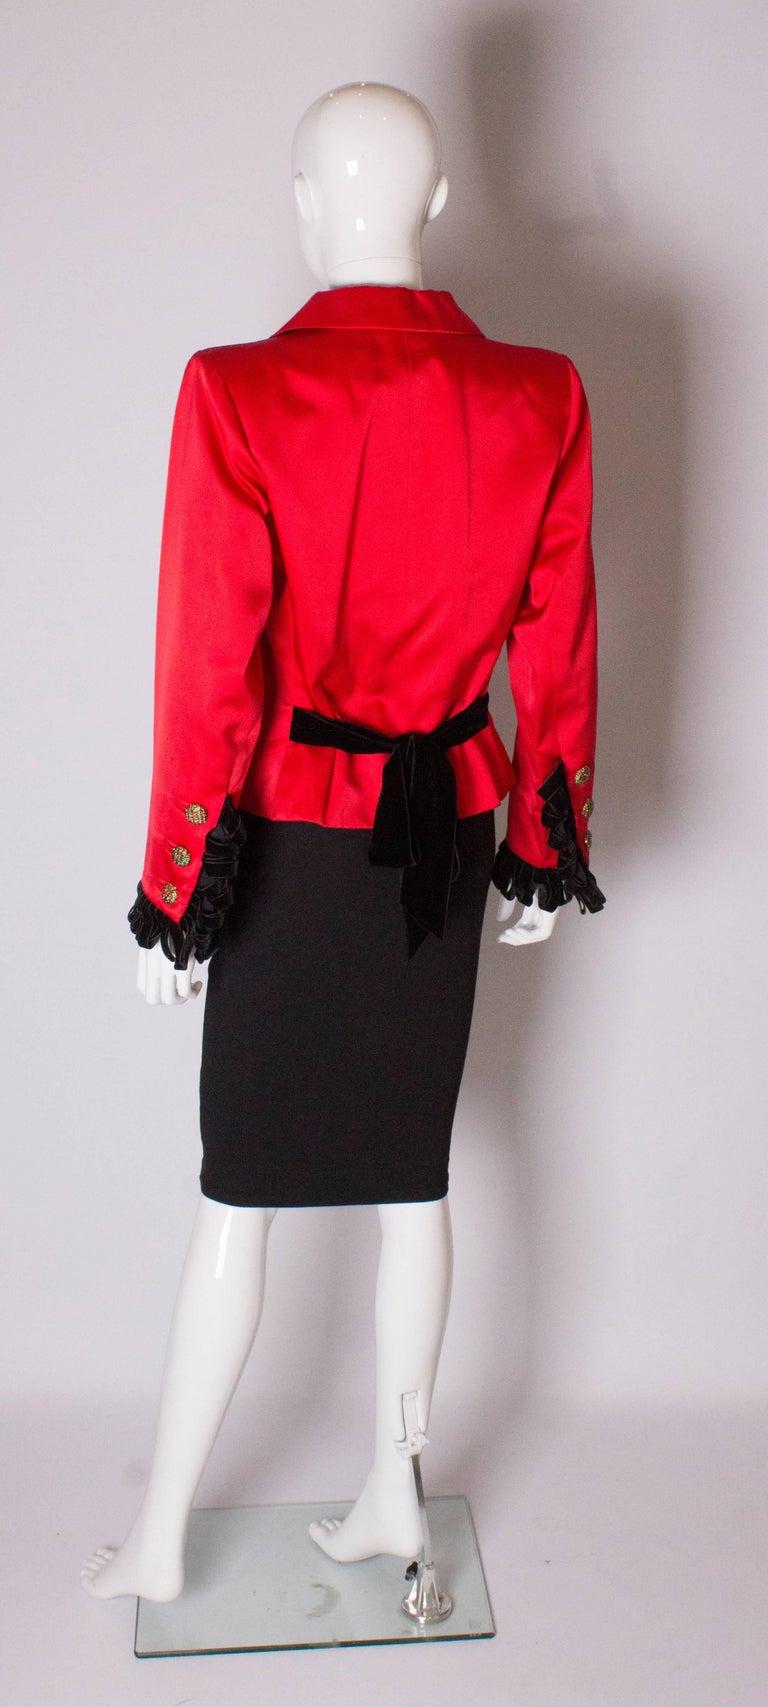 Yves Saint Laurent Rive Gauche Red Vintage Jacket For Sale 1